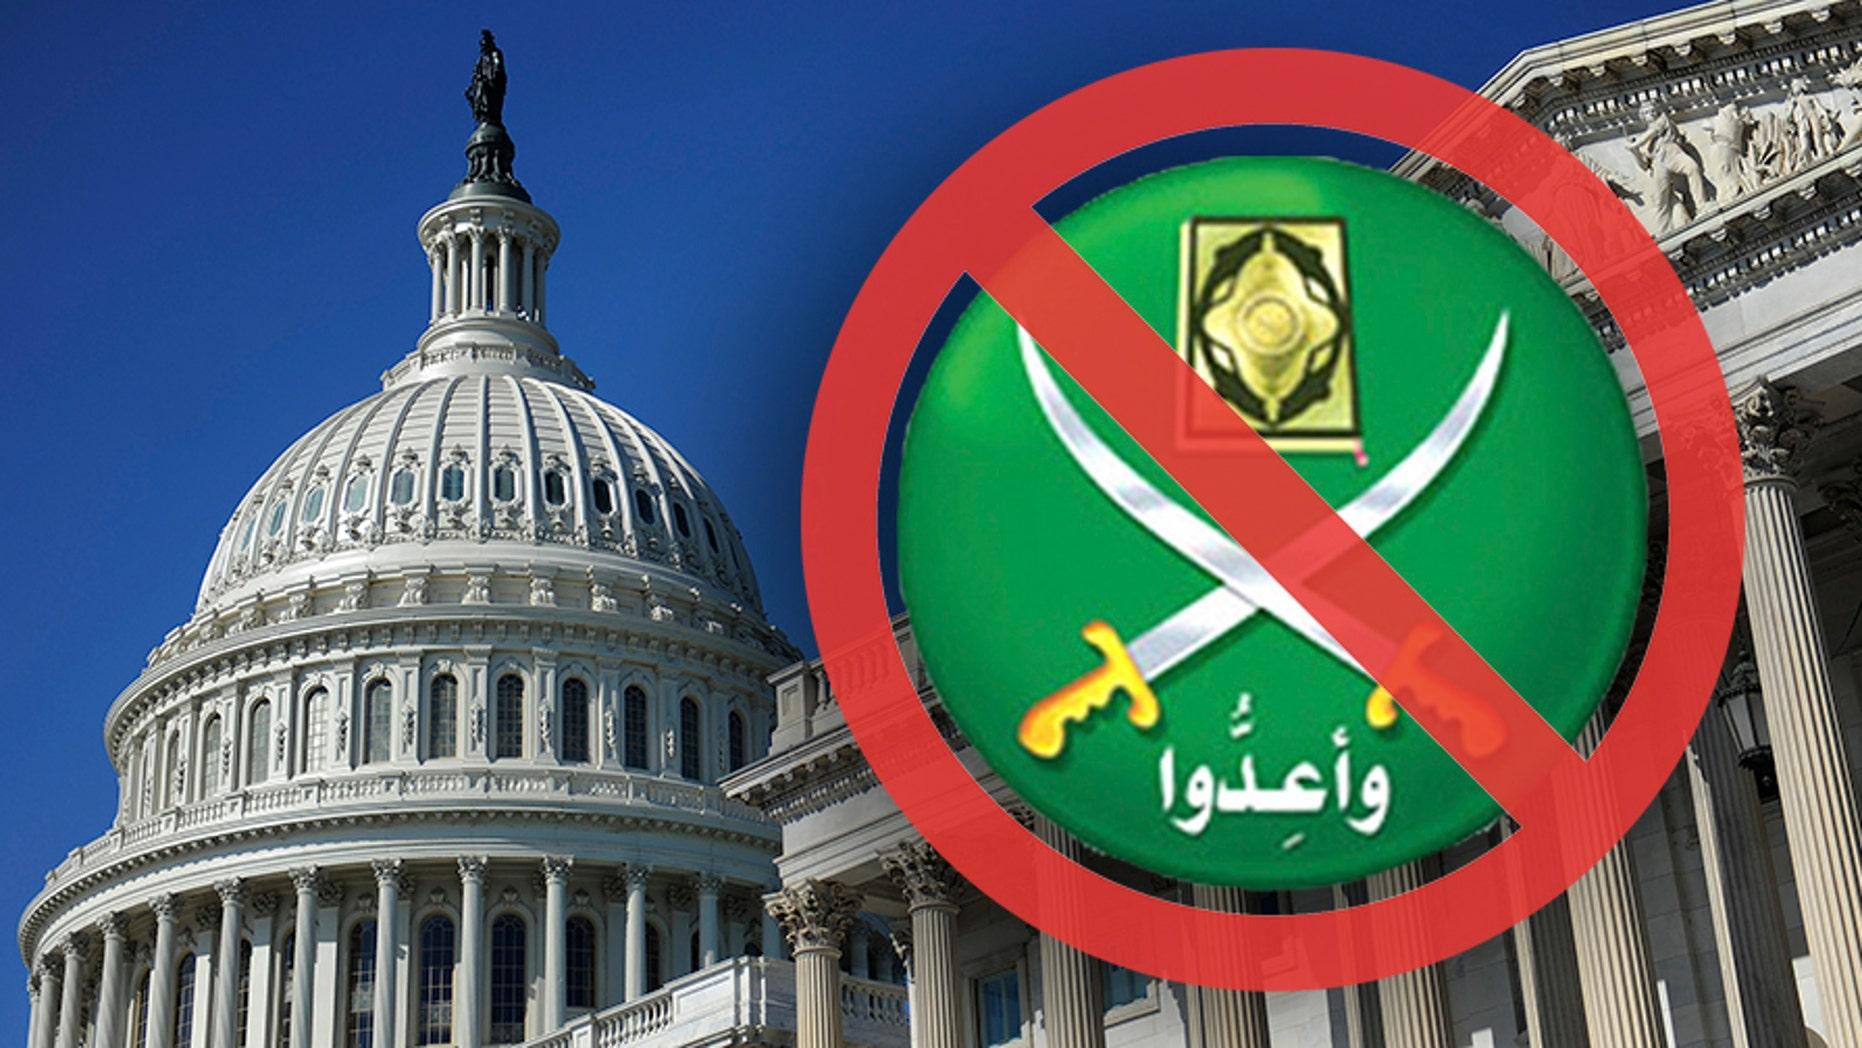 U.S. Capitol and Muslim Brotherhood symbol